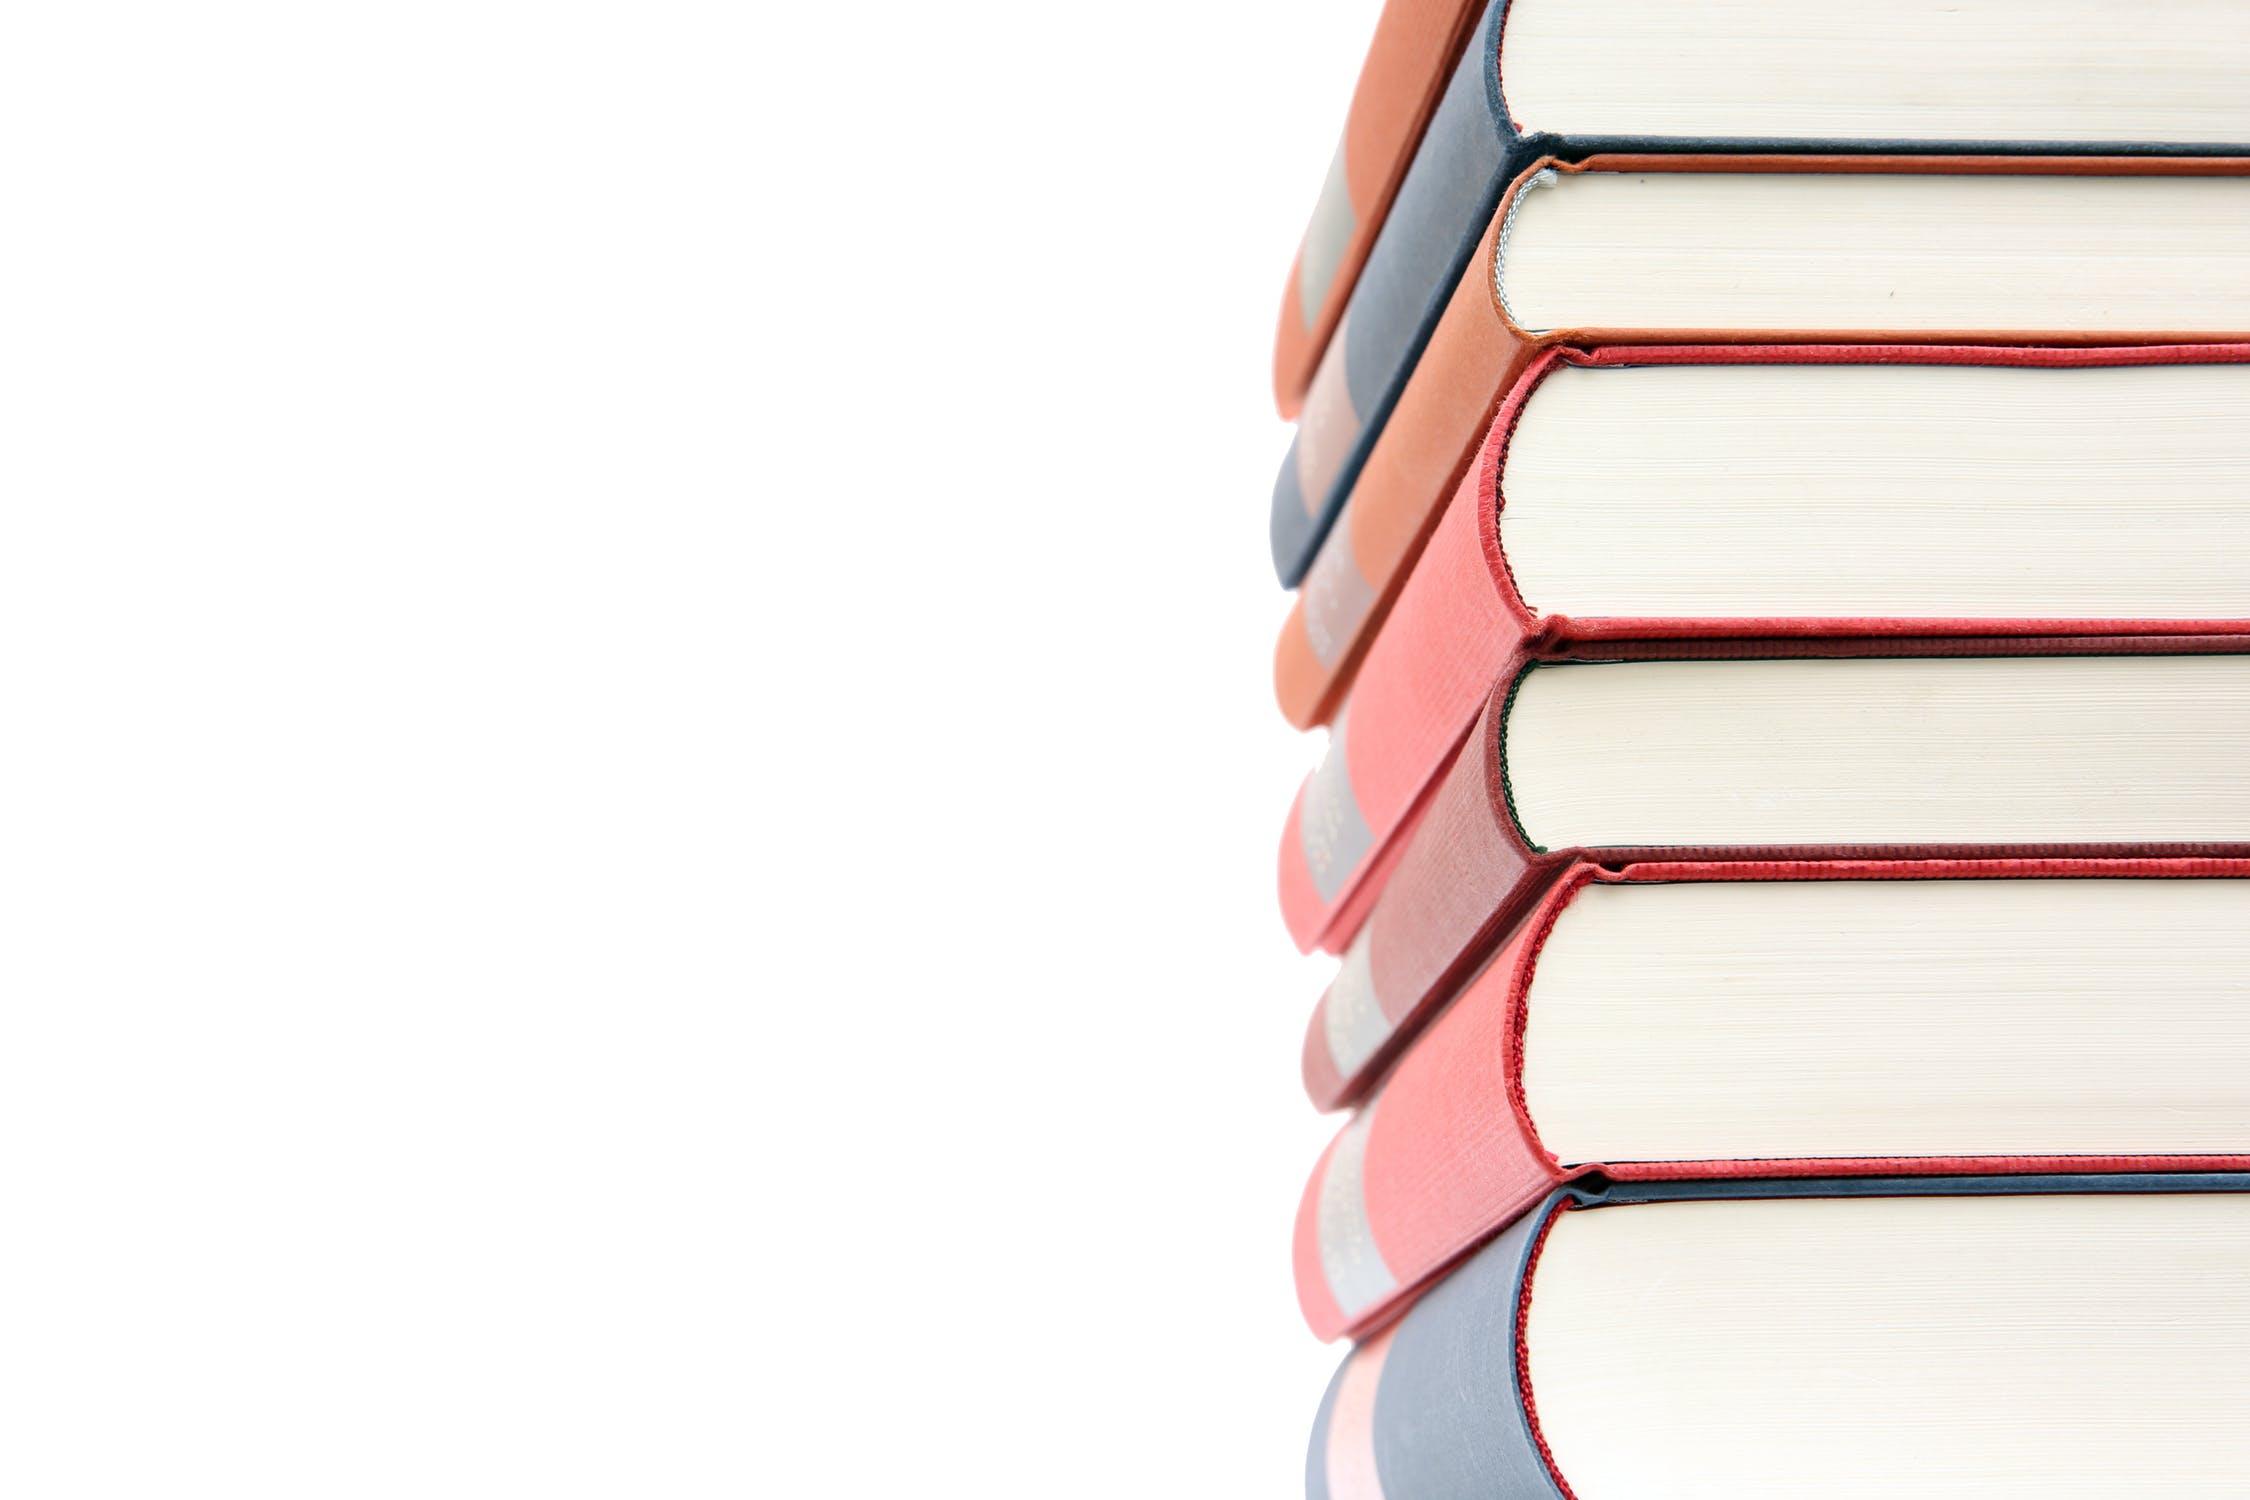 books-education-school-literature-48126.